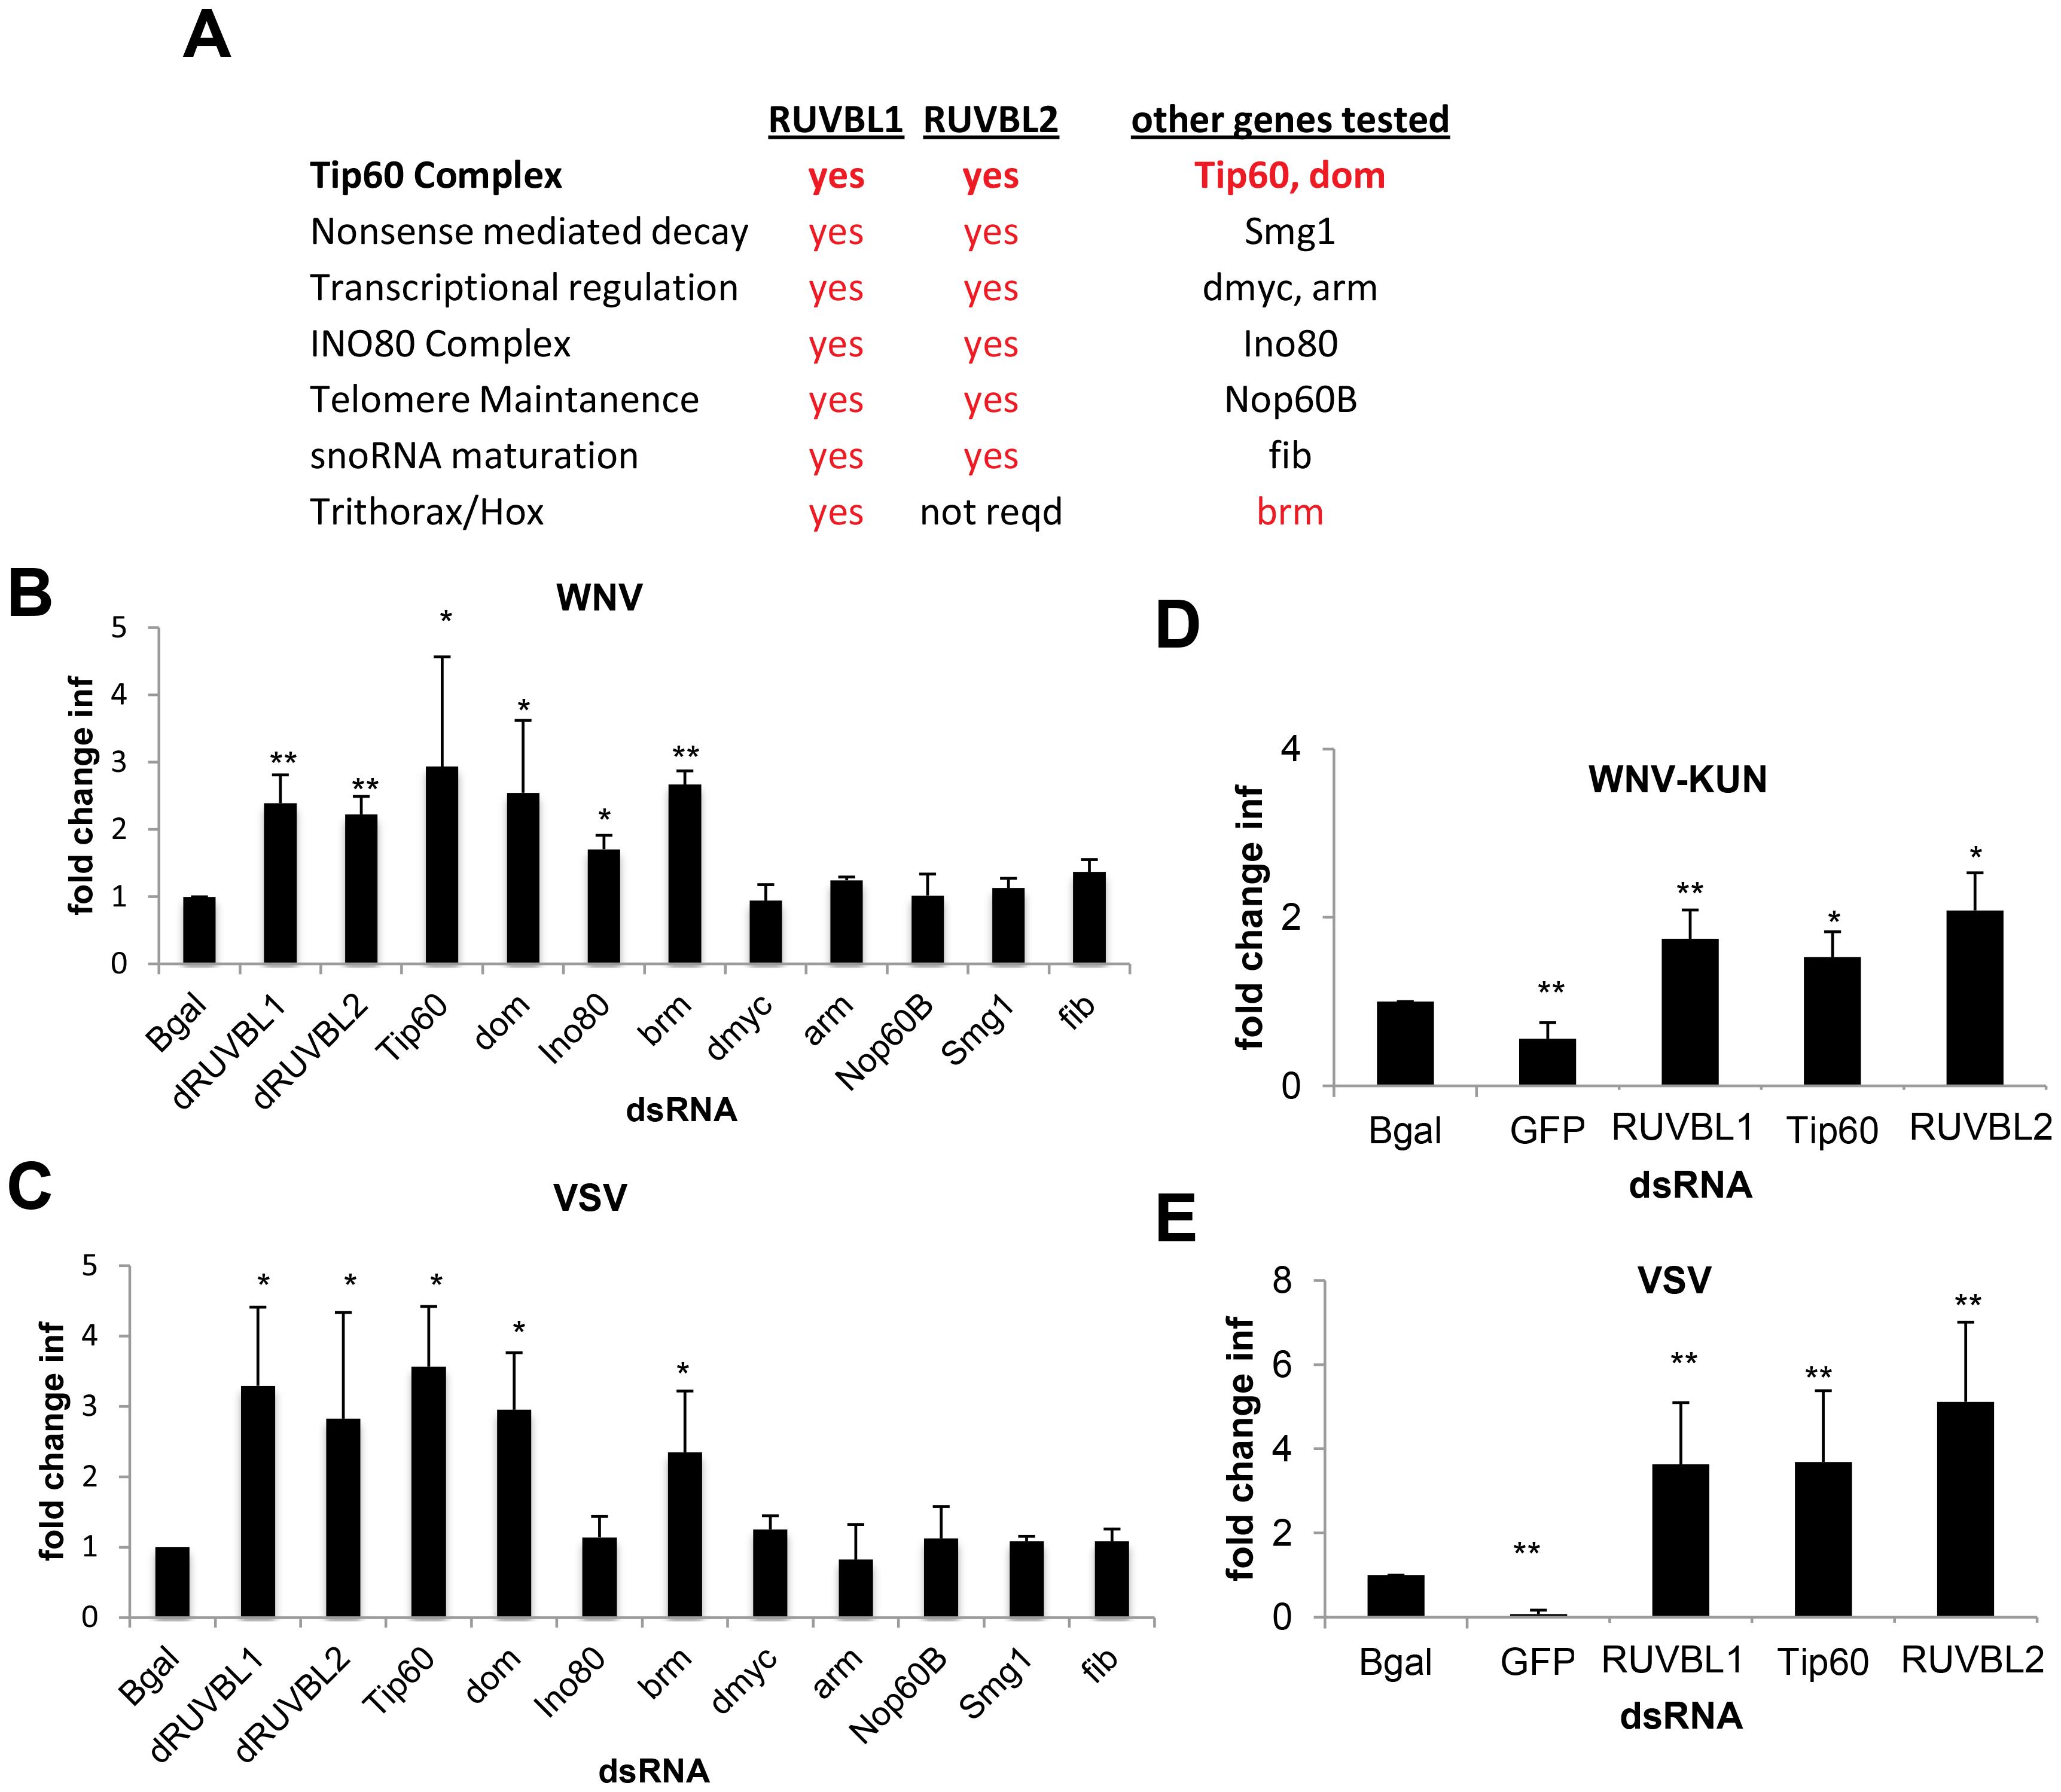 Tip60 complex has antiviral activity.